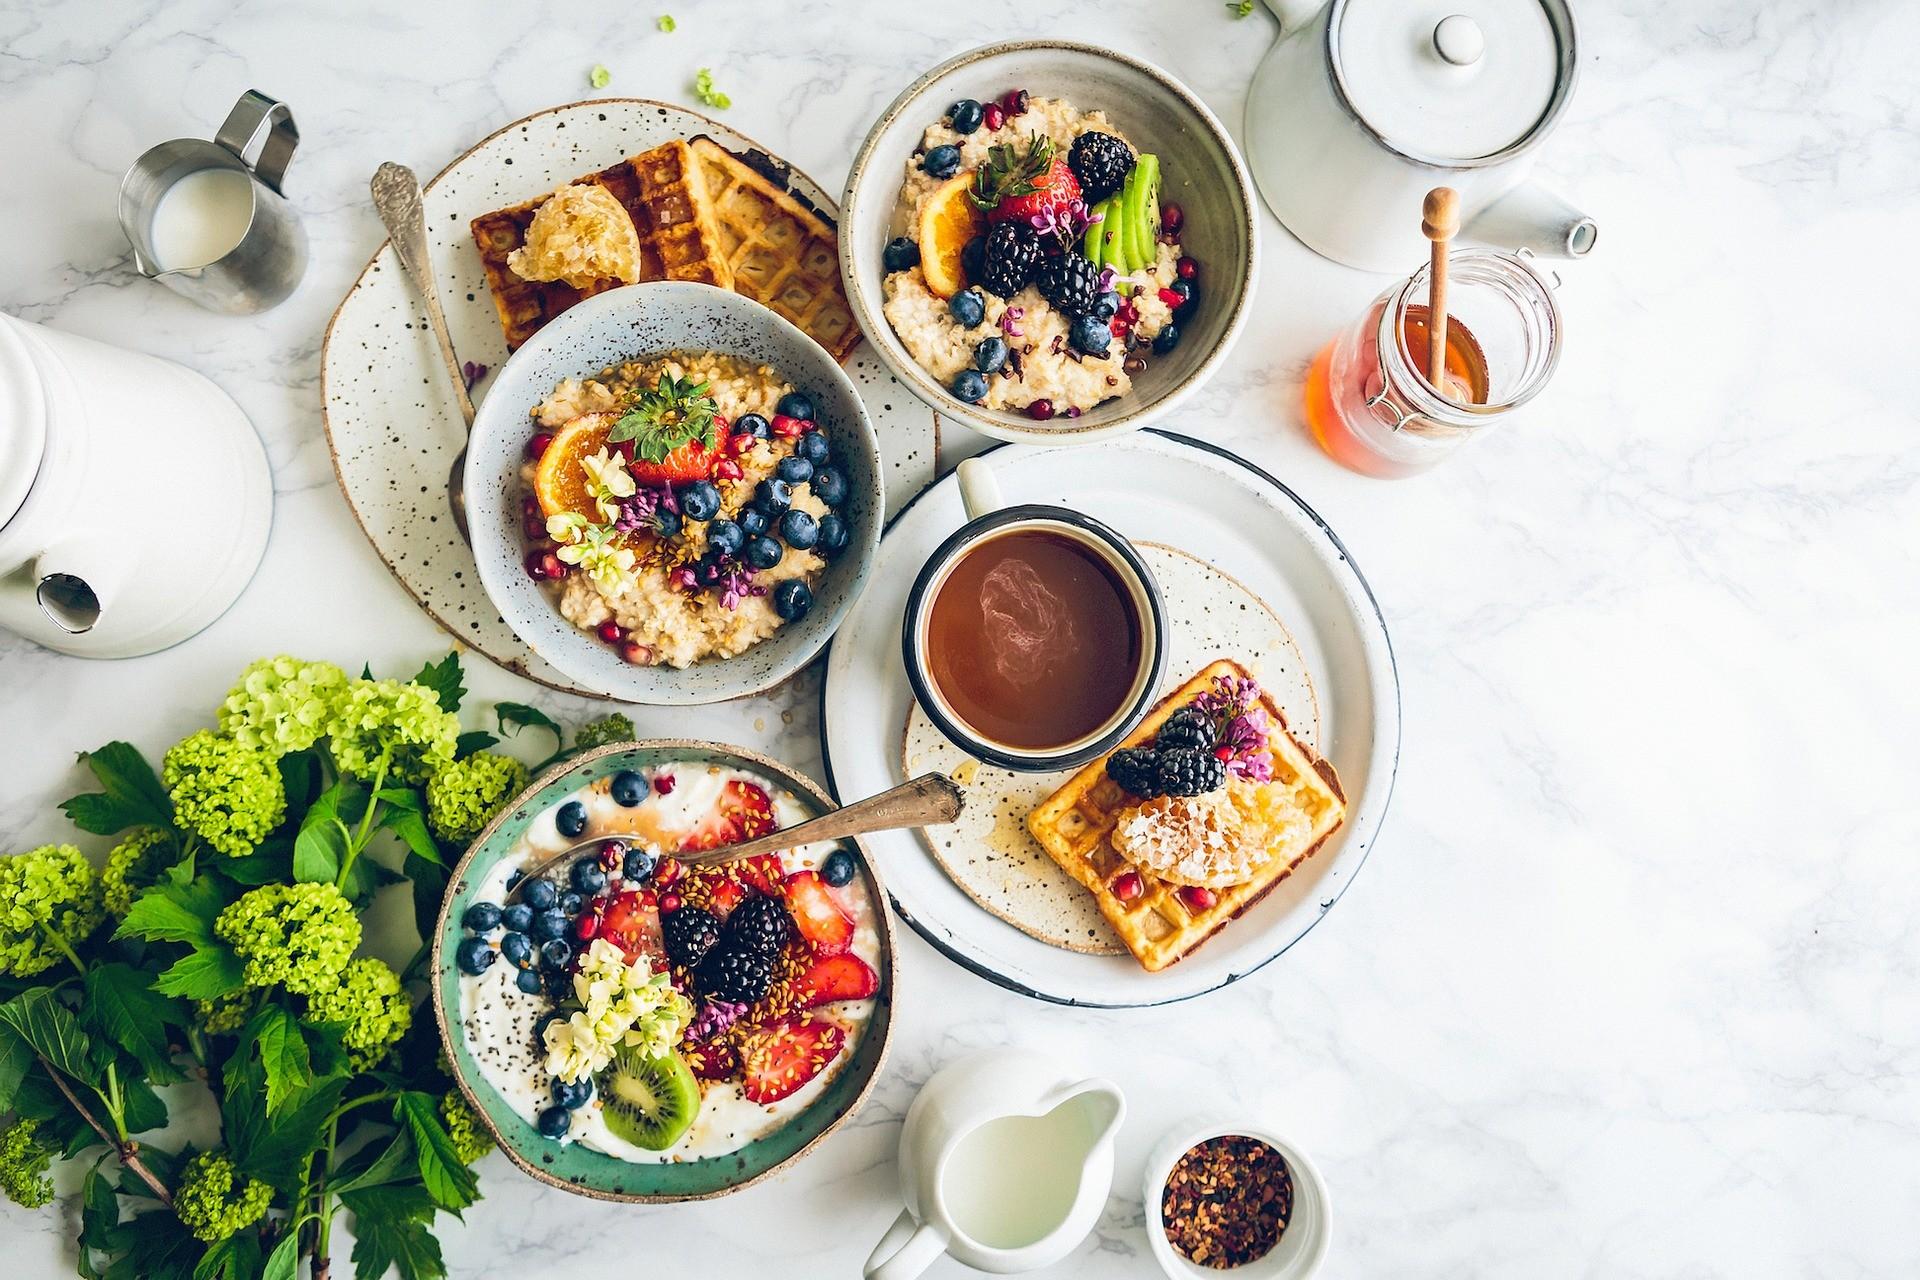 Ernährung mit guten Lebensmitteln